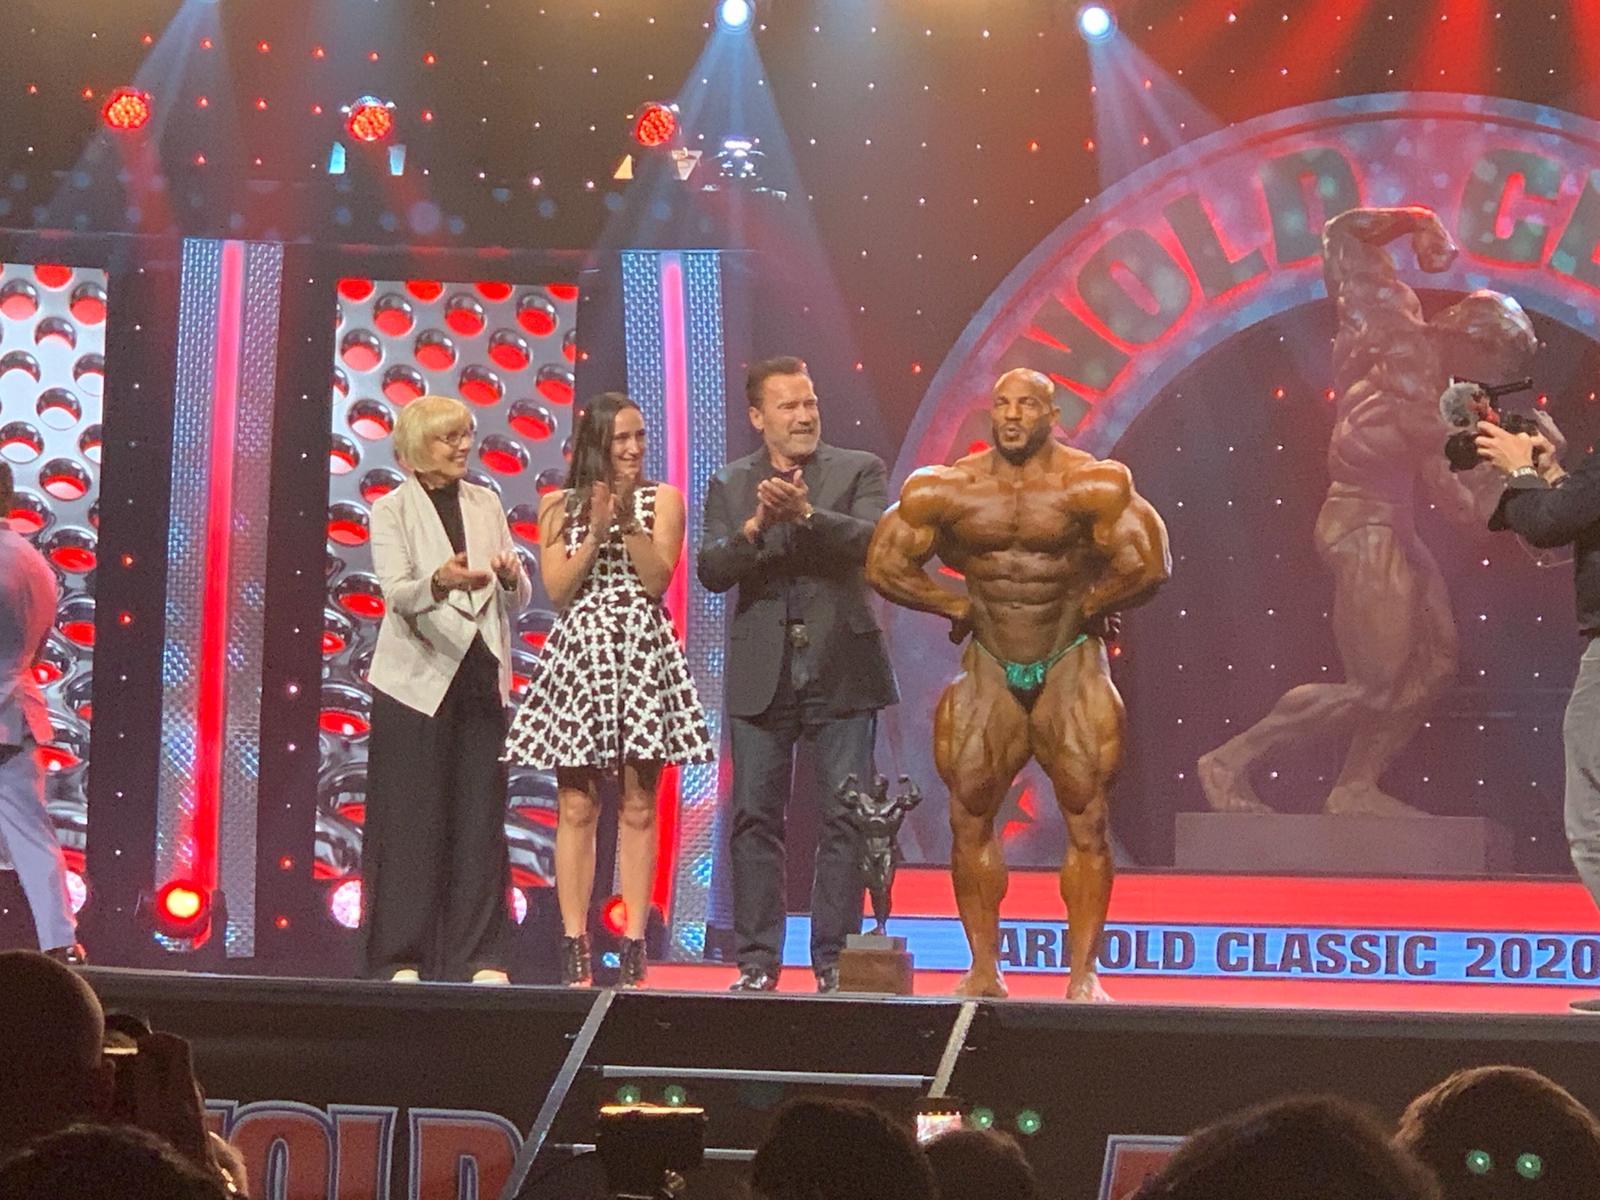 Arnold Classic 2020 Big Ramy Most Muscular Award